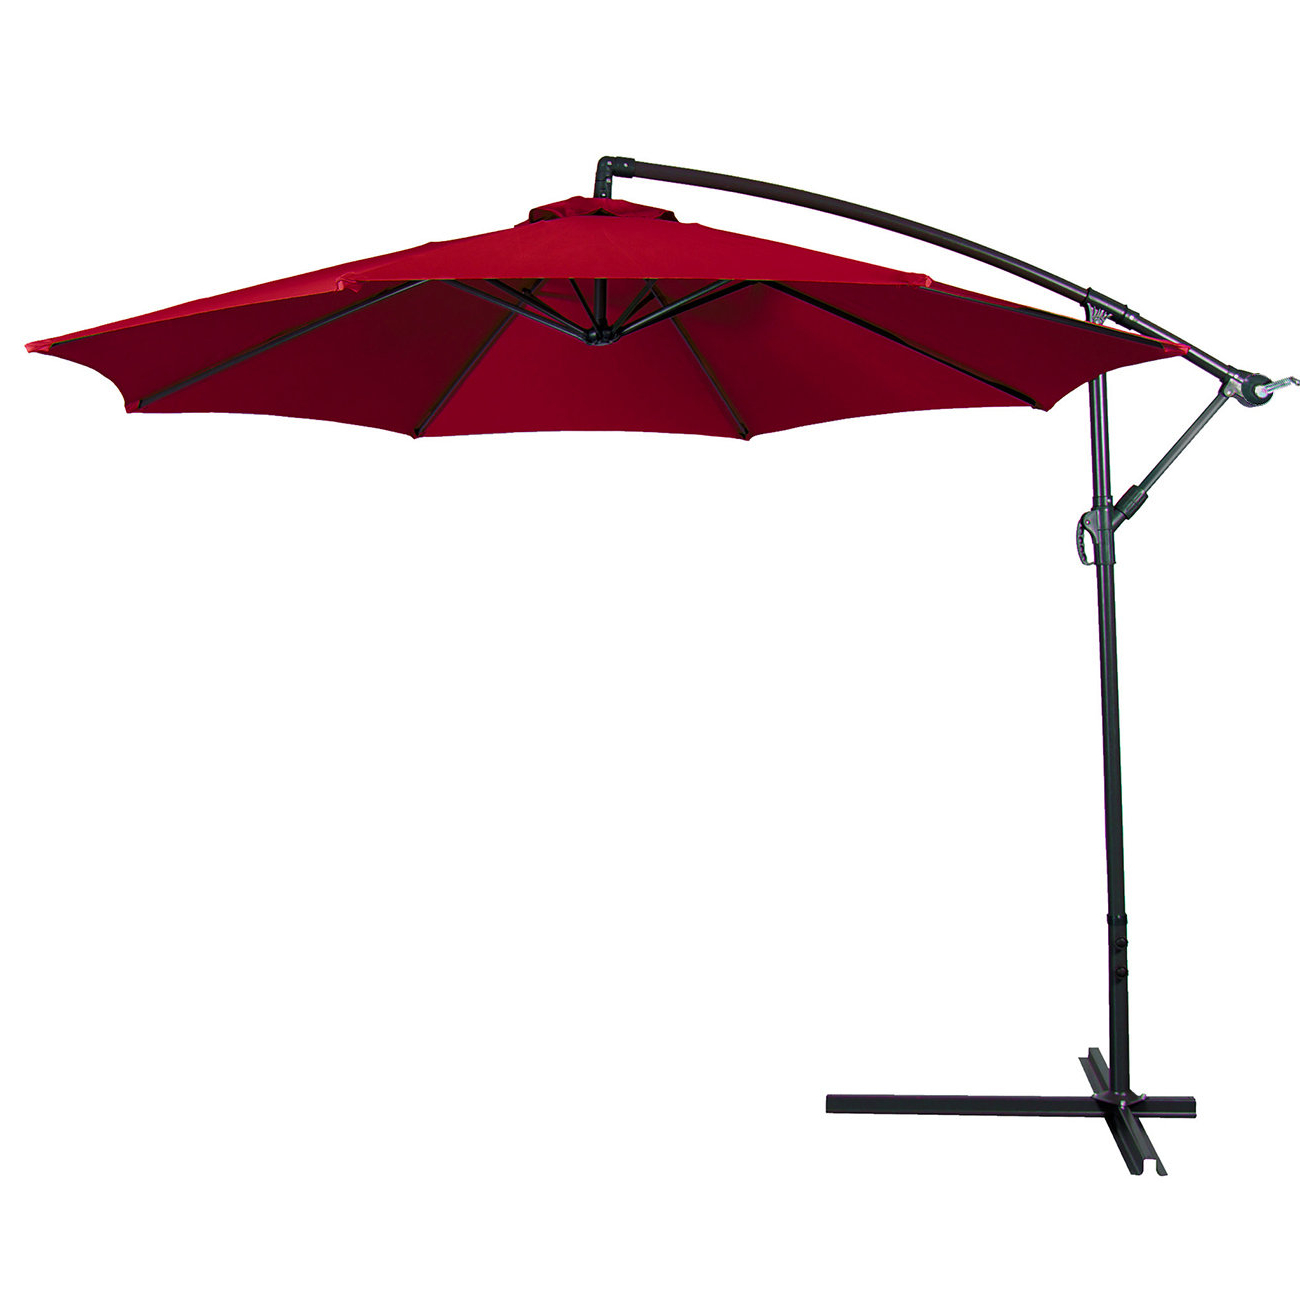 Newest Bormann Cantilever Umbrellas Within Bormann 10' Cantilever Umbrella (View 4 of 20)